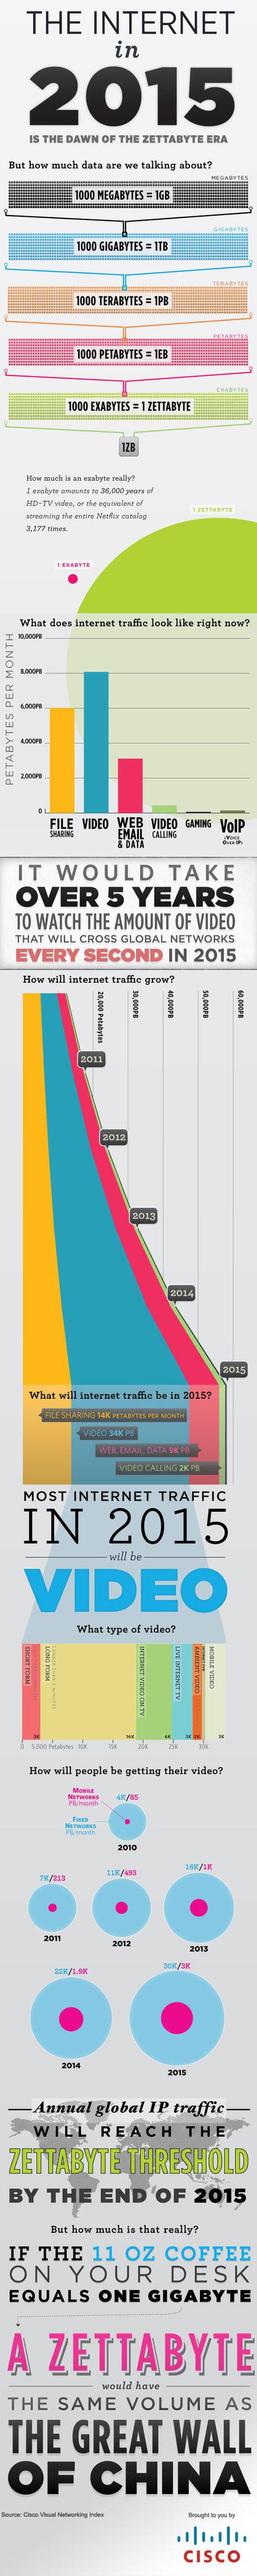 TheInternetin2015_4e0893a777c9c.jpg (612x6136 pixels) | Top 5 Infographics | Scoop.it